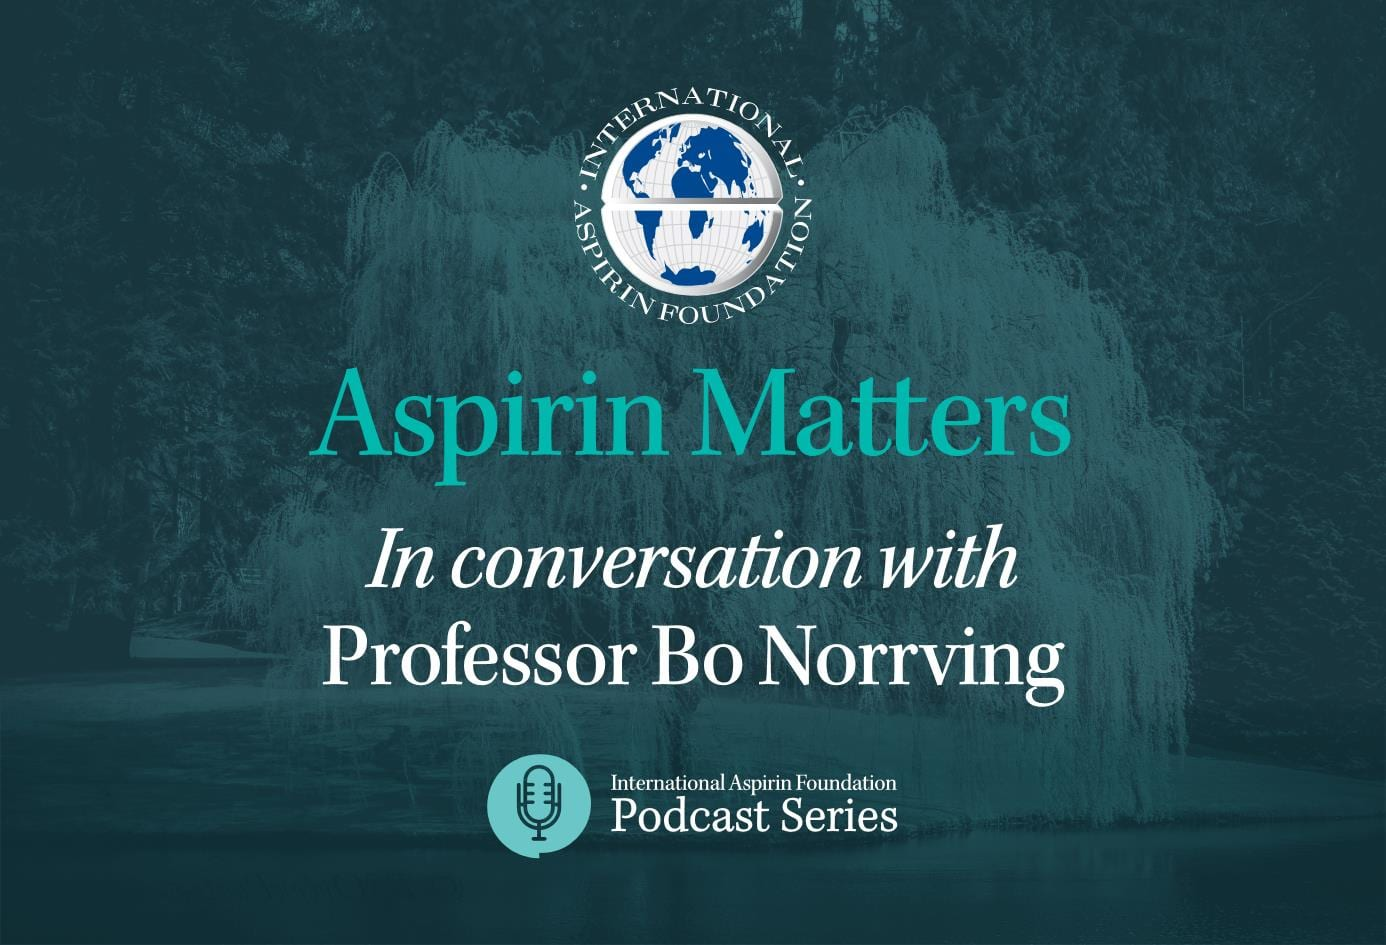 Aspirin Matter Podcasts 240221 Page 2